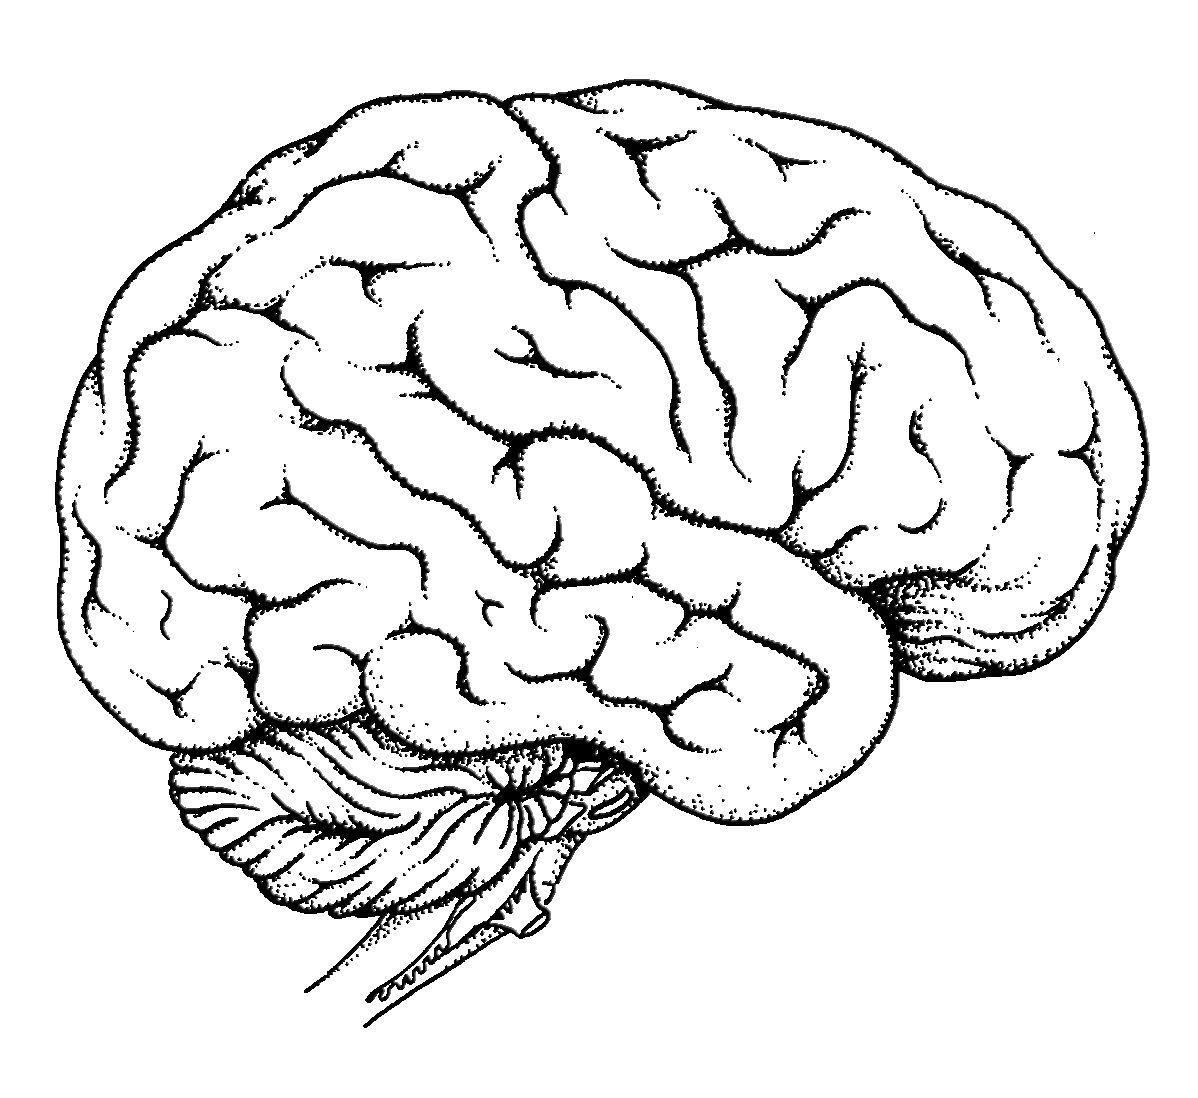 Diagram of human brain anatomy alicias brain pinterest diagram of human brain anatomy ccuart Gallery